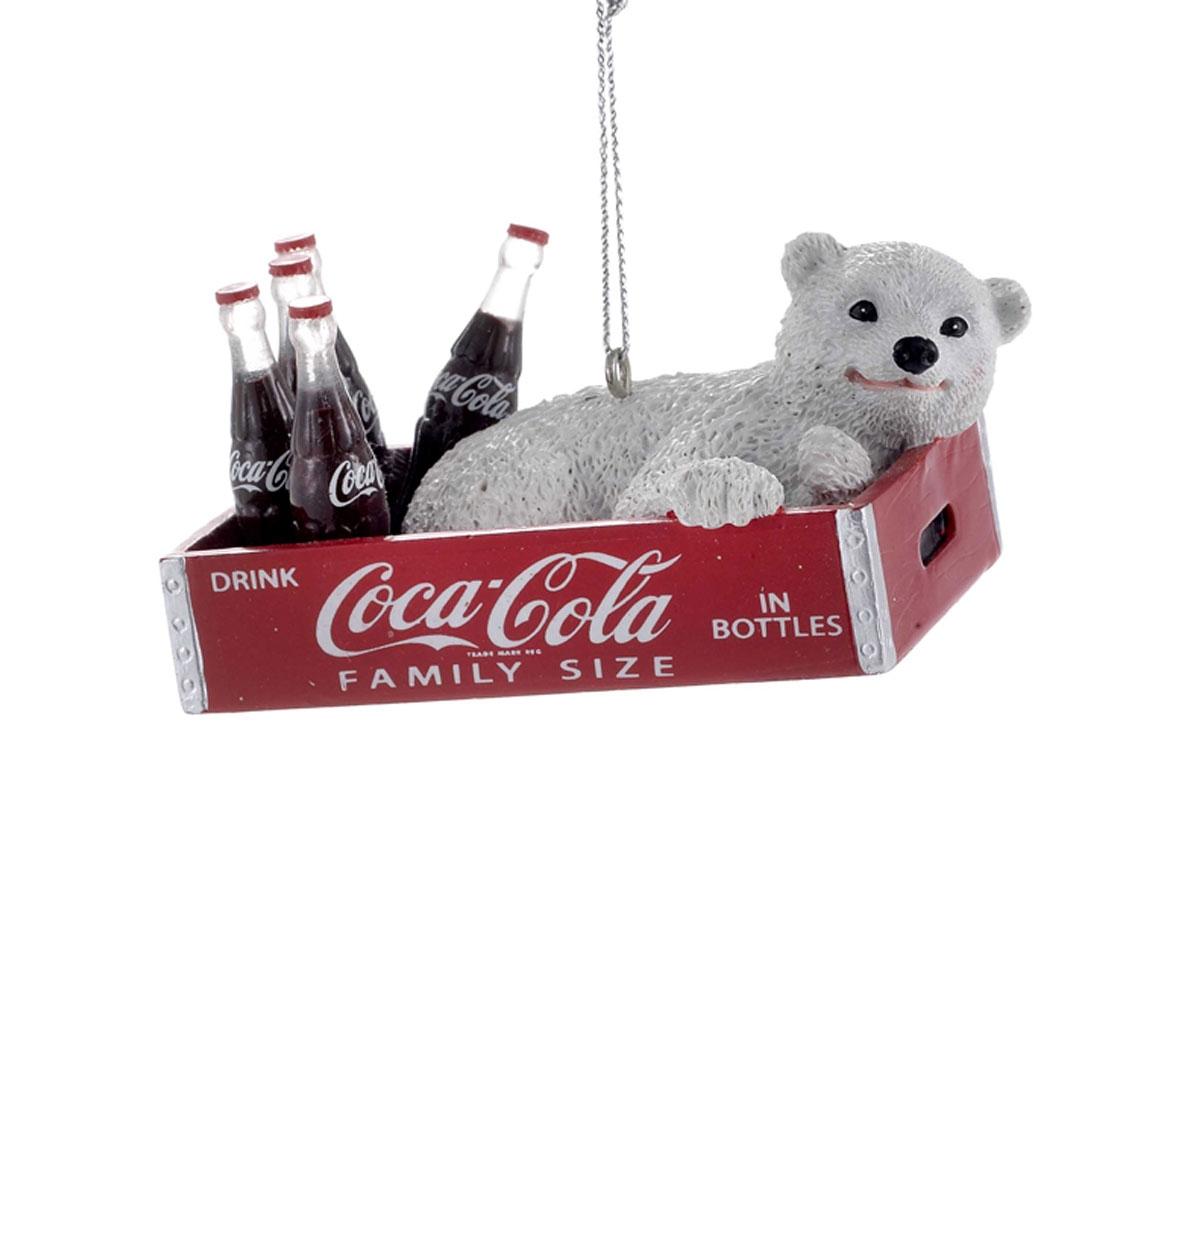 Coca-Cola Polar Bear Cub Christmas Ornament